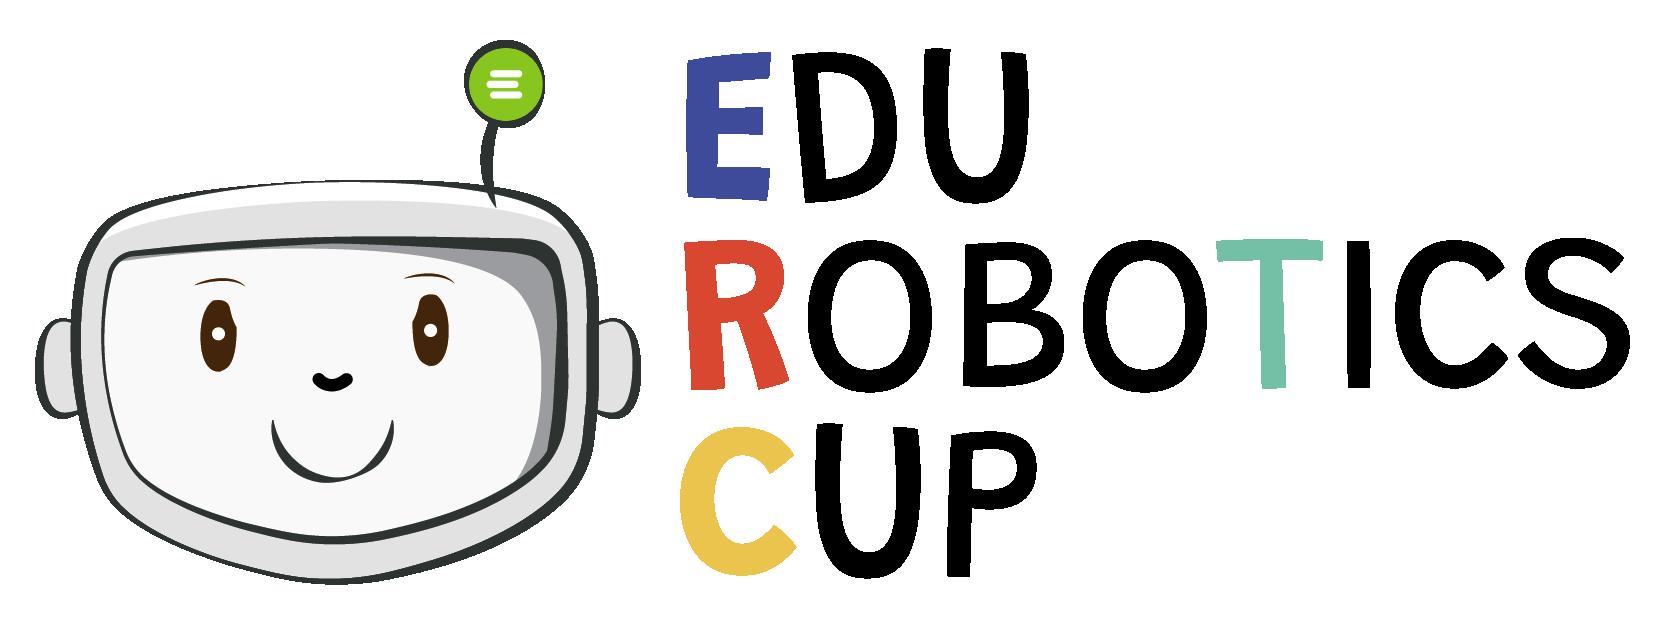 edu robotics cup logo